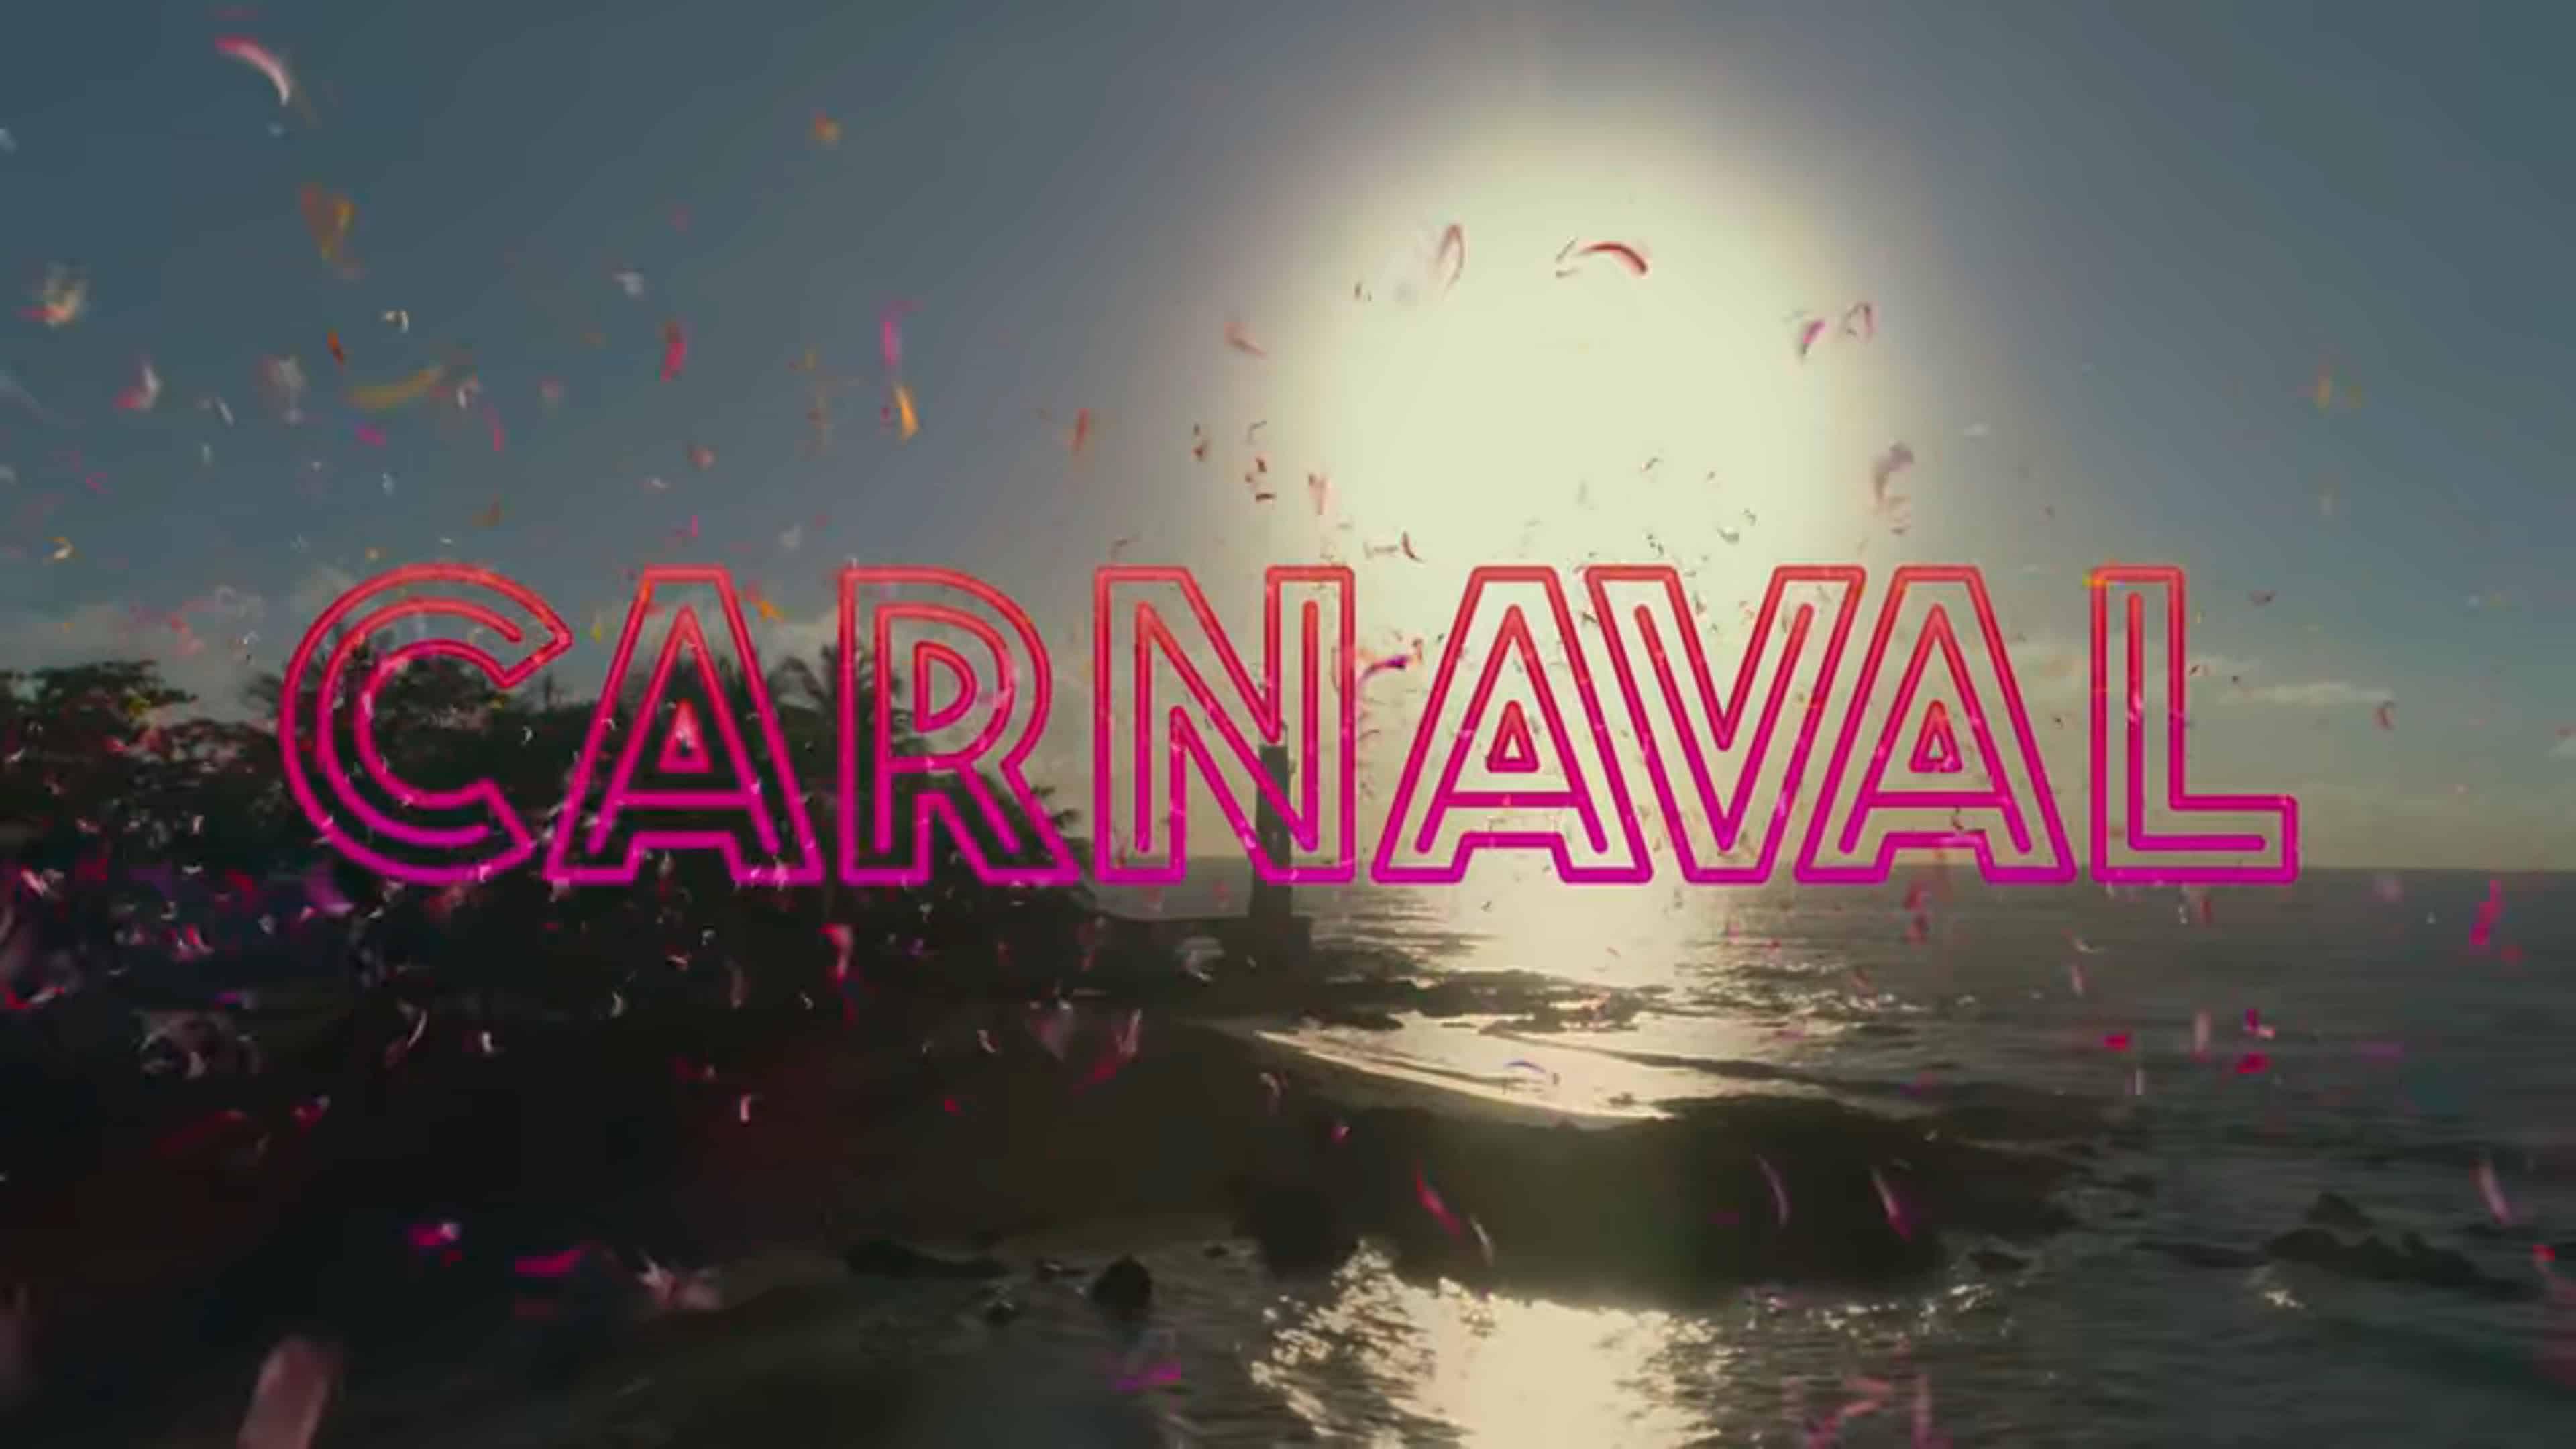 Title Card - Carnaval (2021)